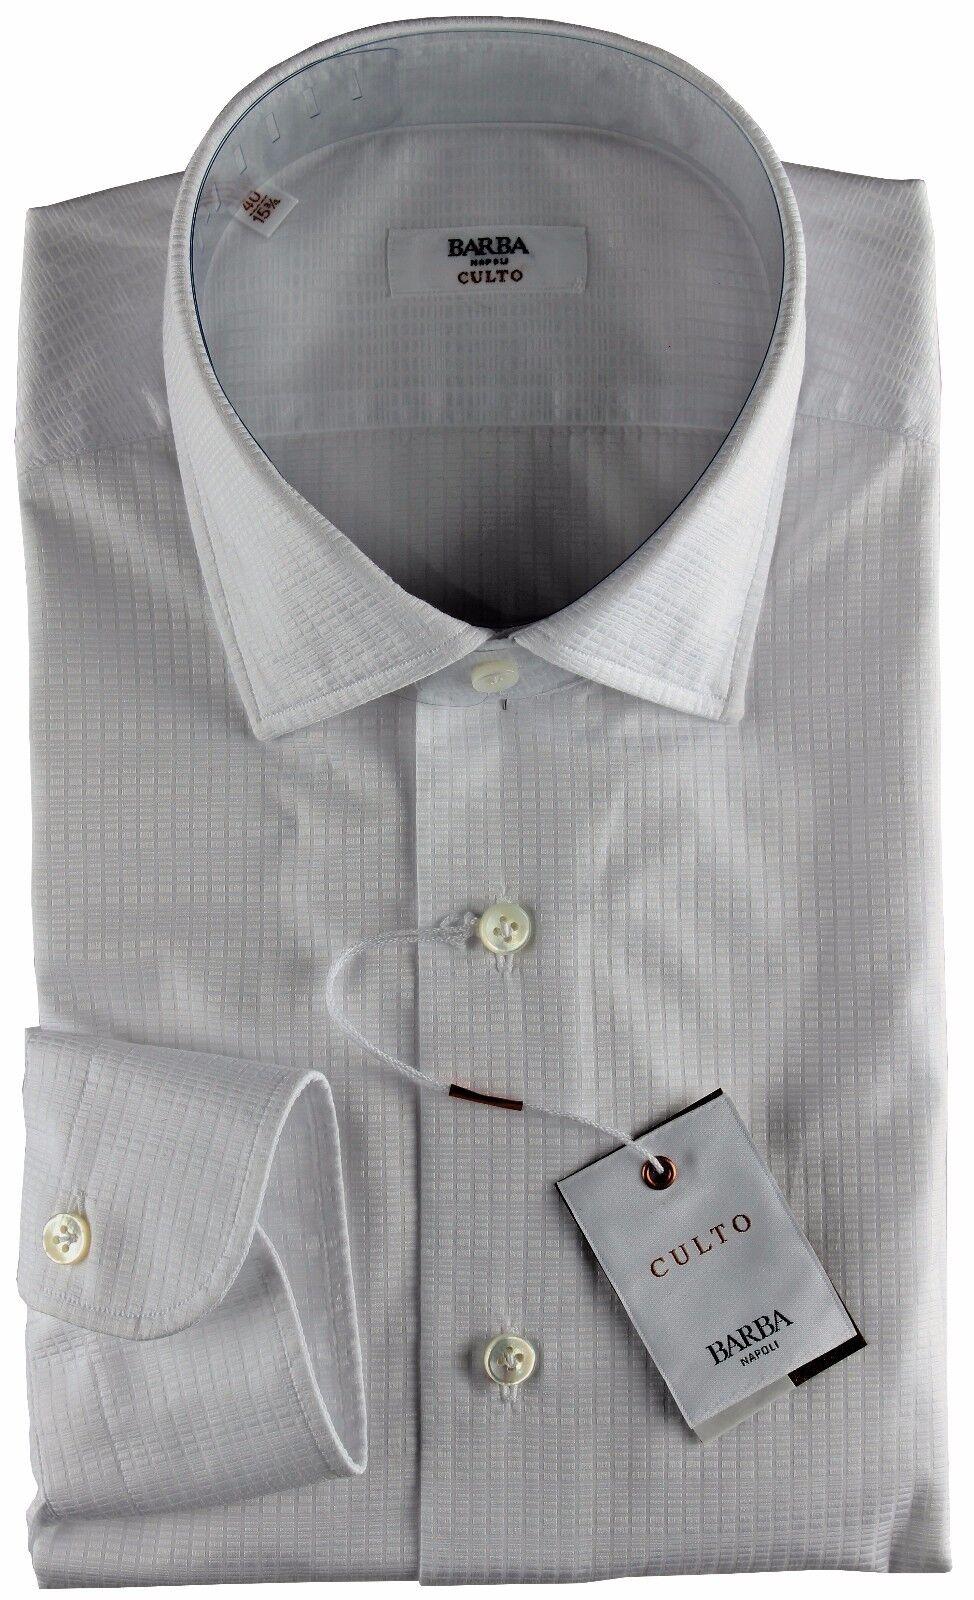 NWT BARBA NAPOLI DRESS SHIRT Culto Weiß geometric luxury handmade 40 15 3/4